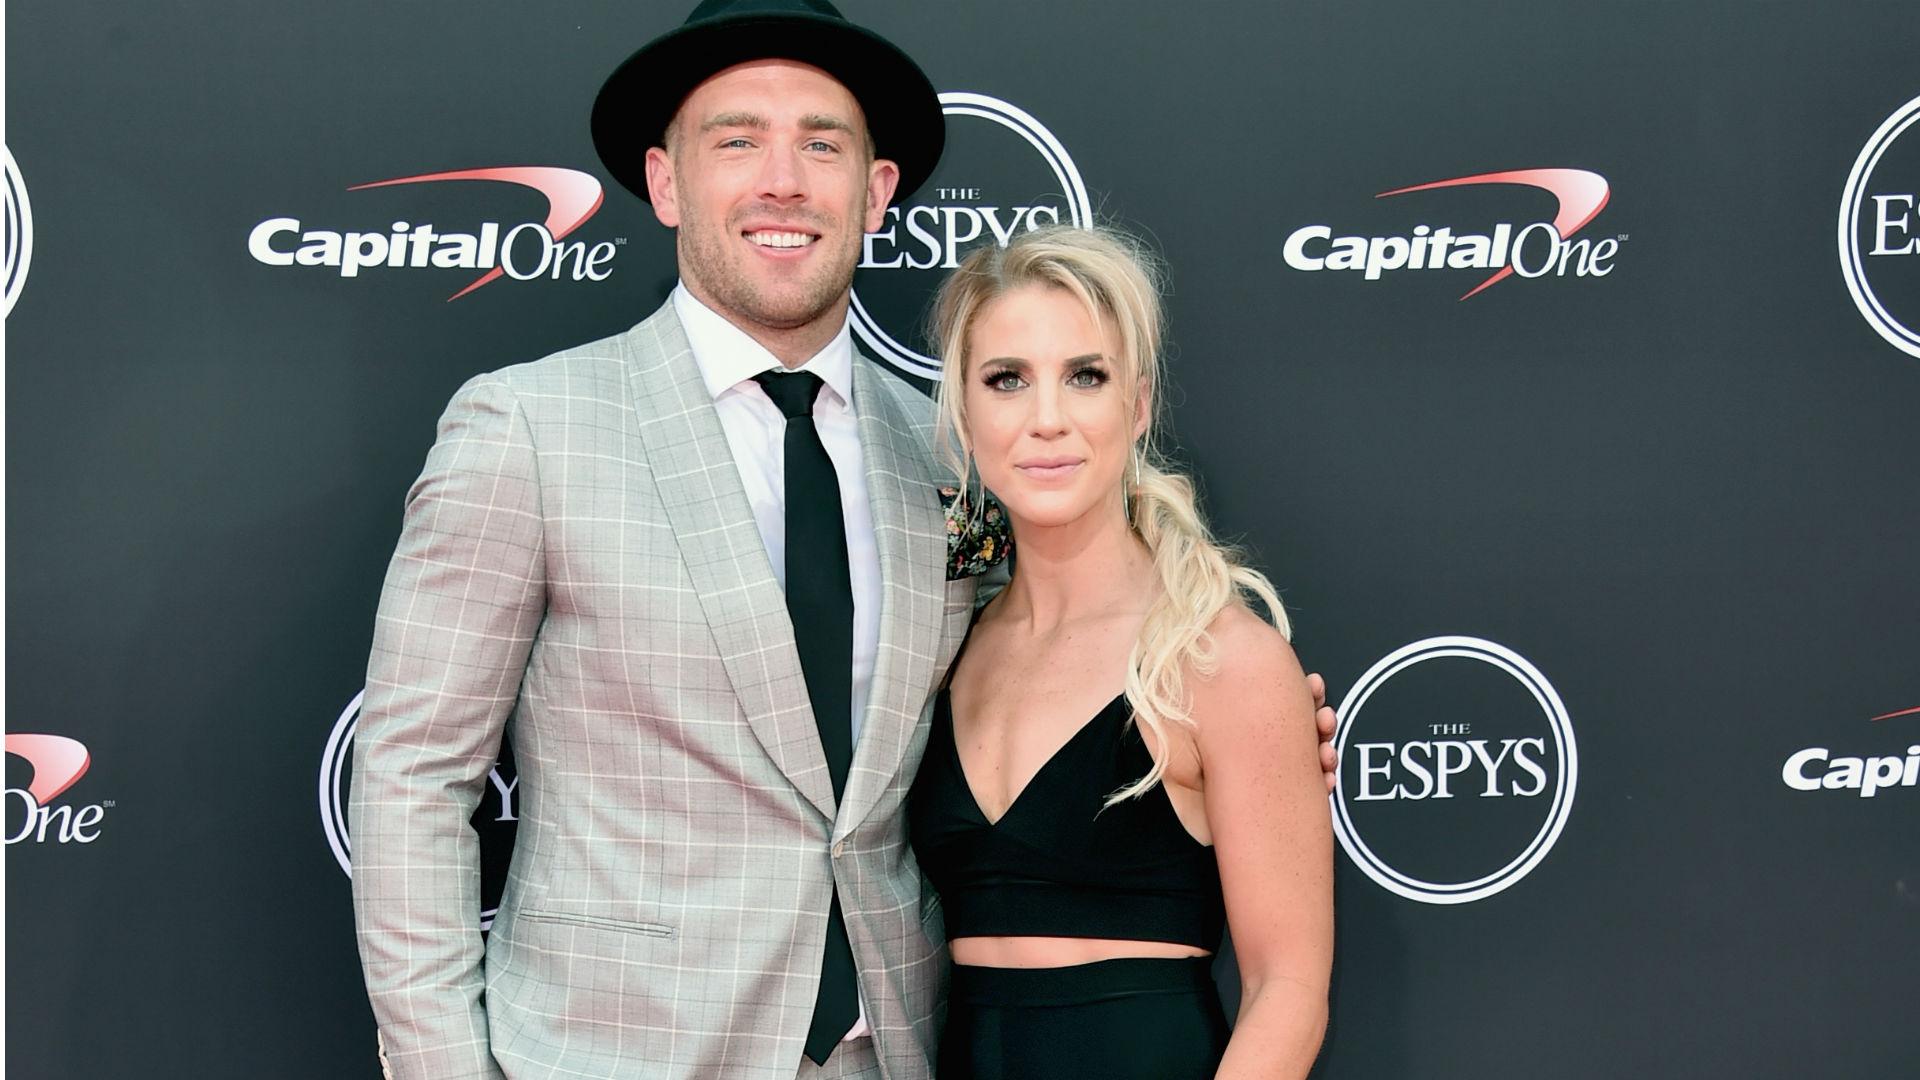 Julie Ertz was most 'nervous' cheering on Zach Ertz at Super Bowl